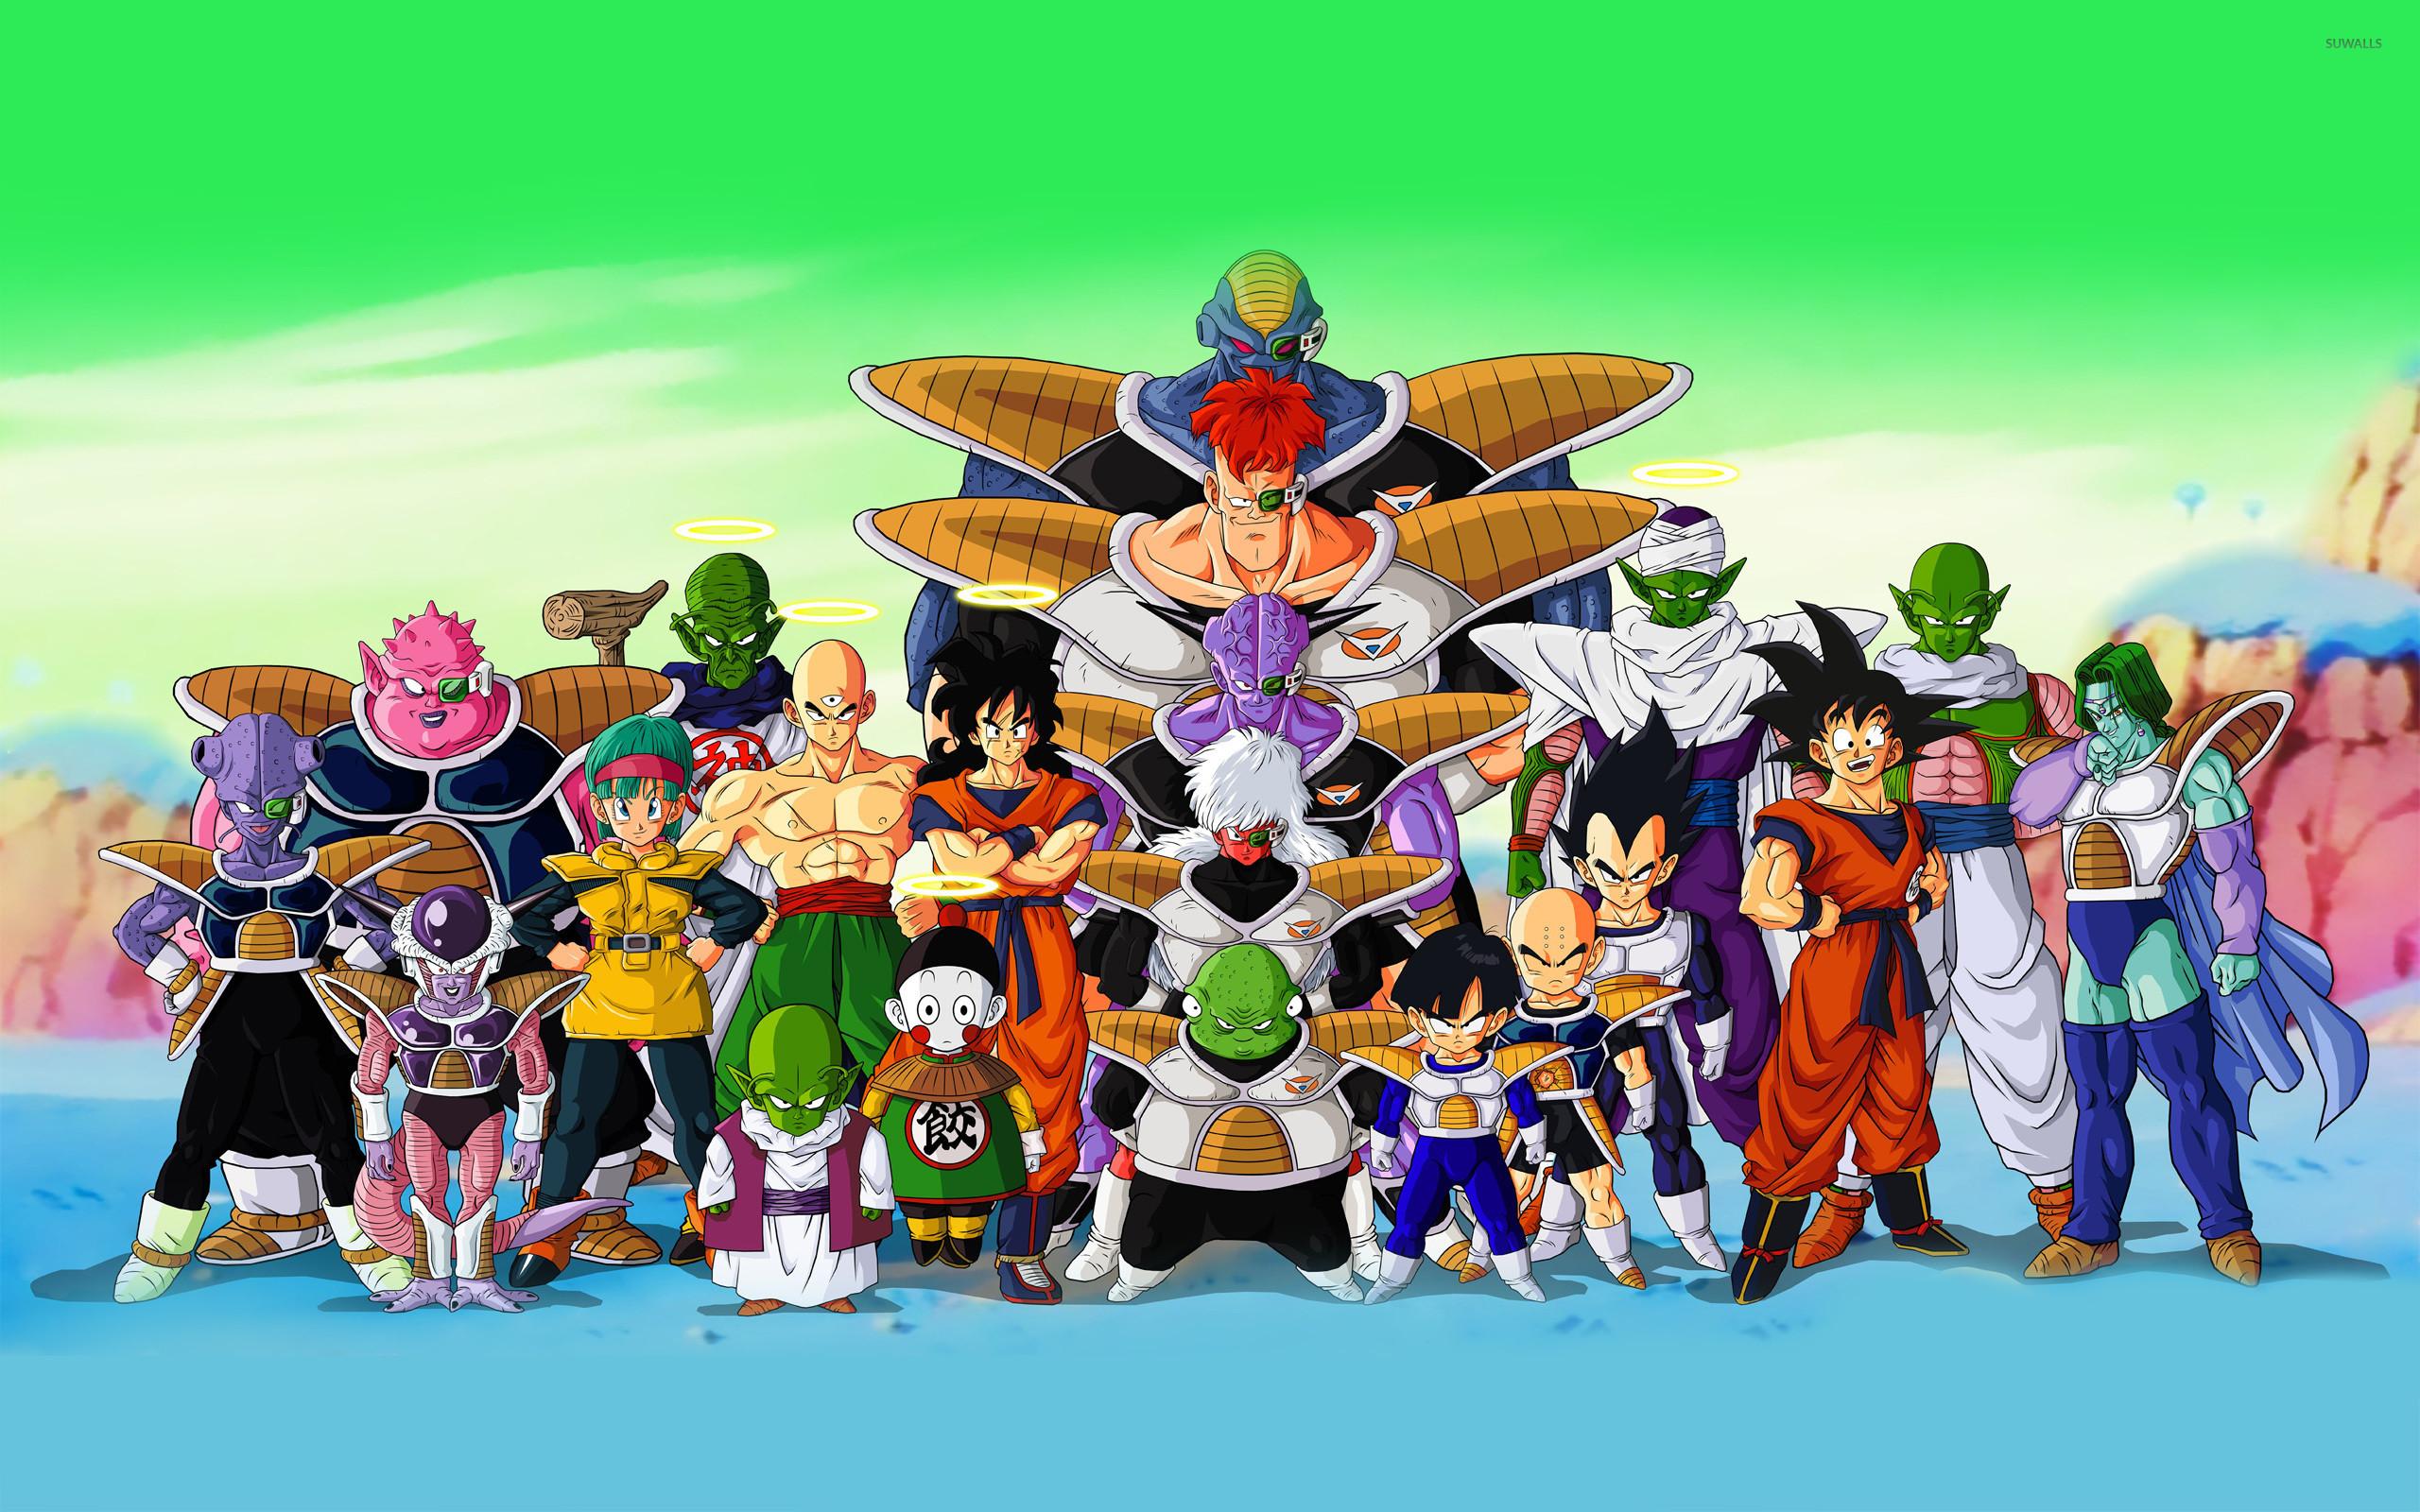 Dragon Ball Z [3] wallpaper jpg